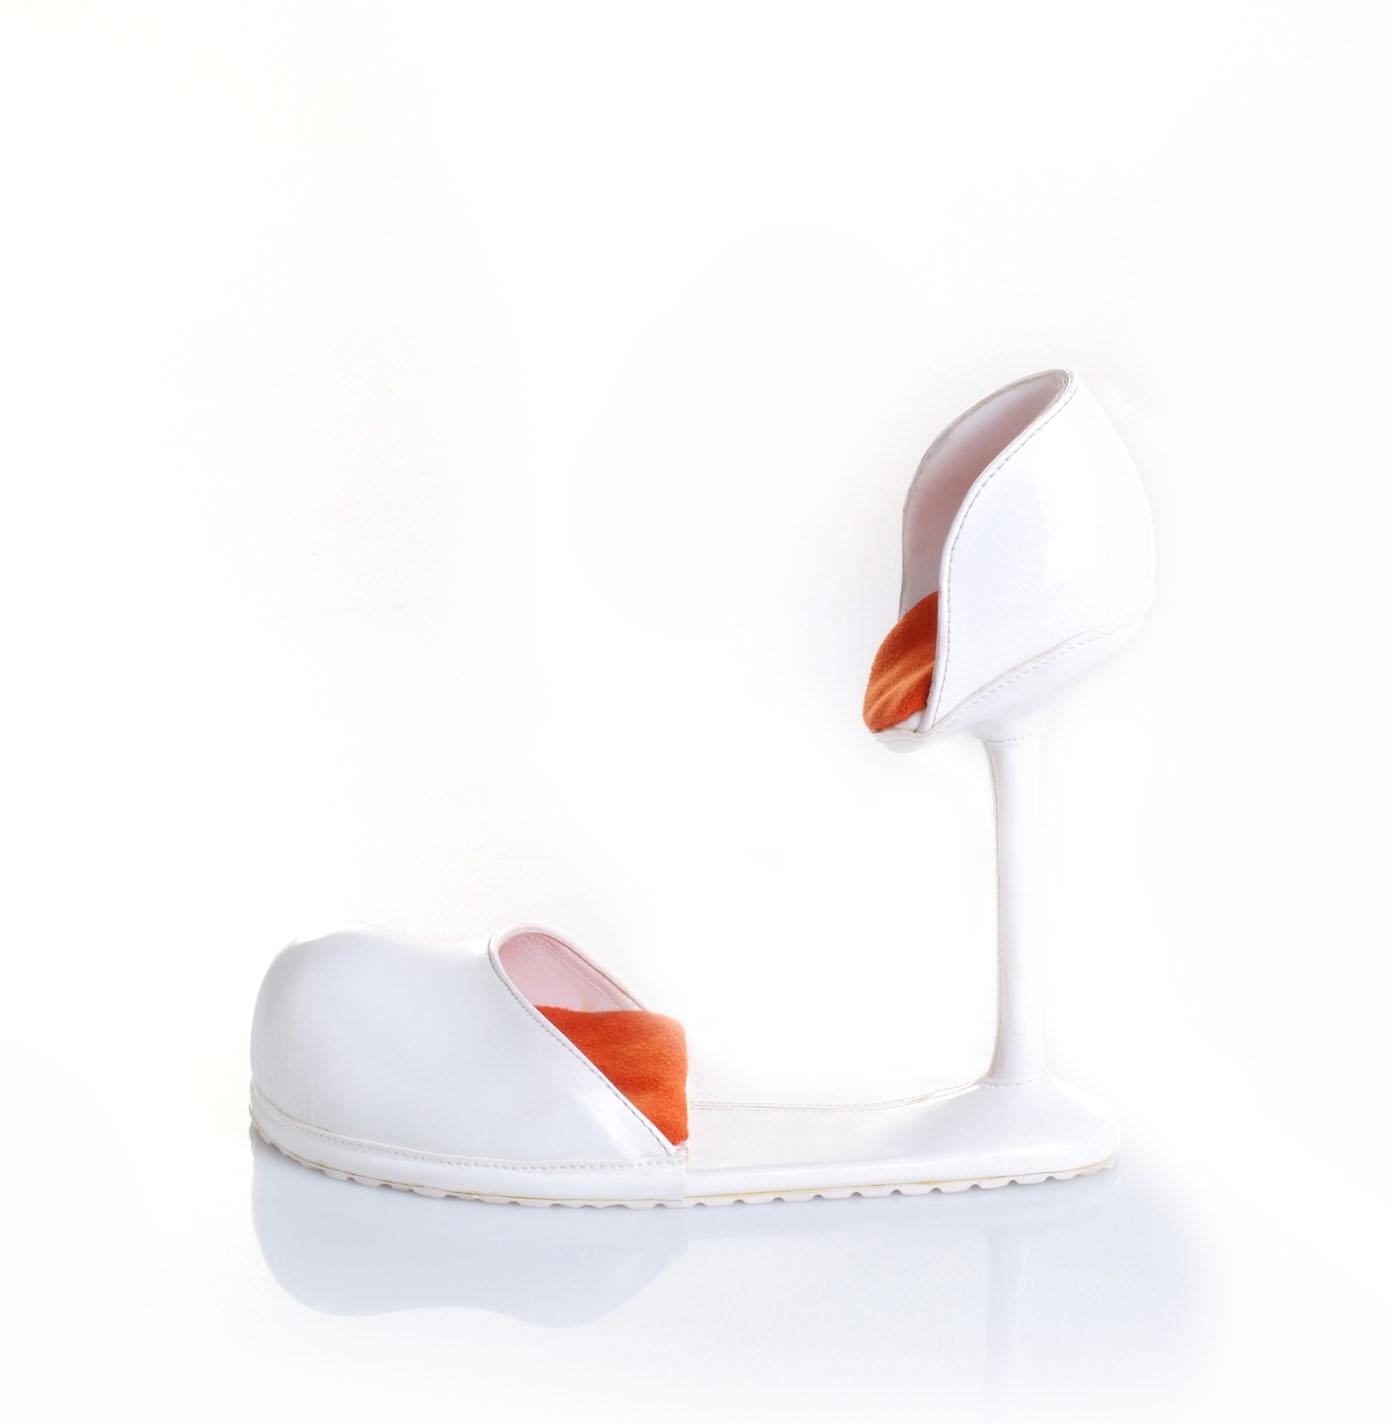 tulip21 Artistic Footwear Designs by Kobi Levi